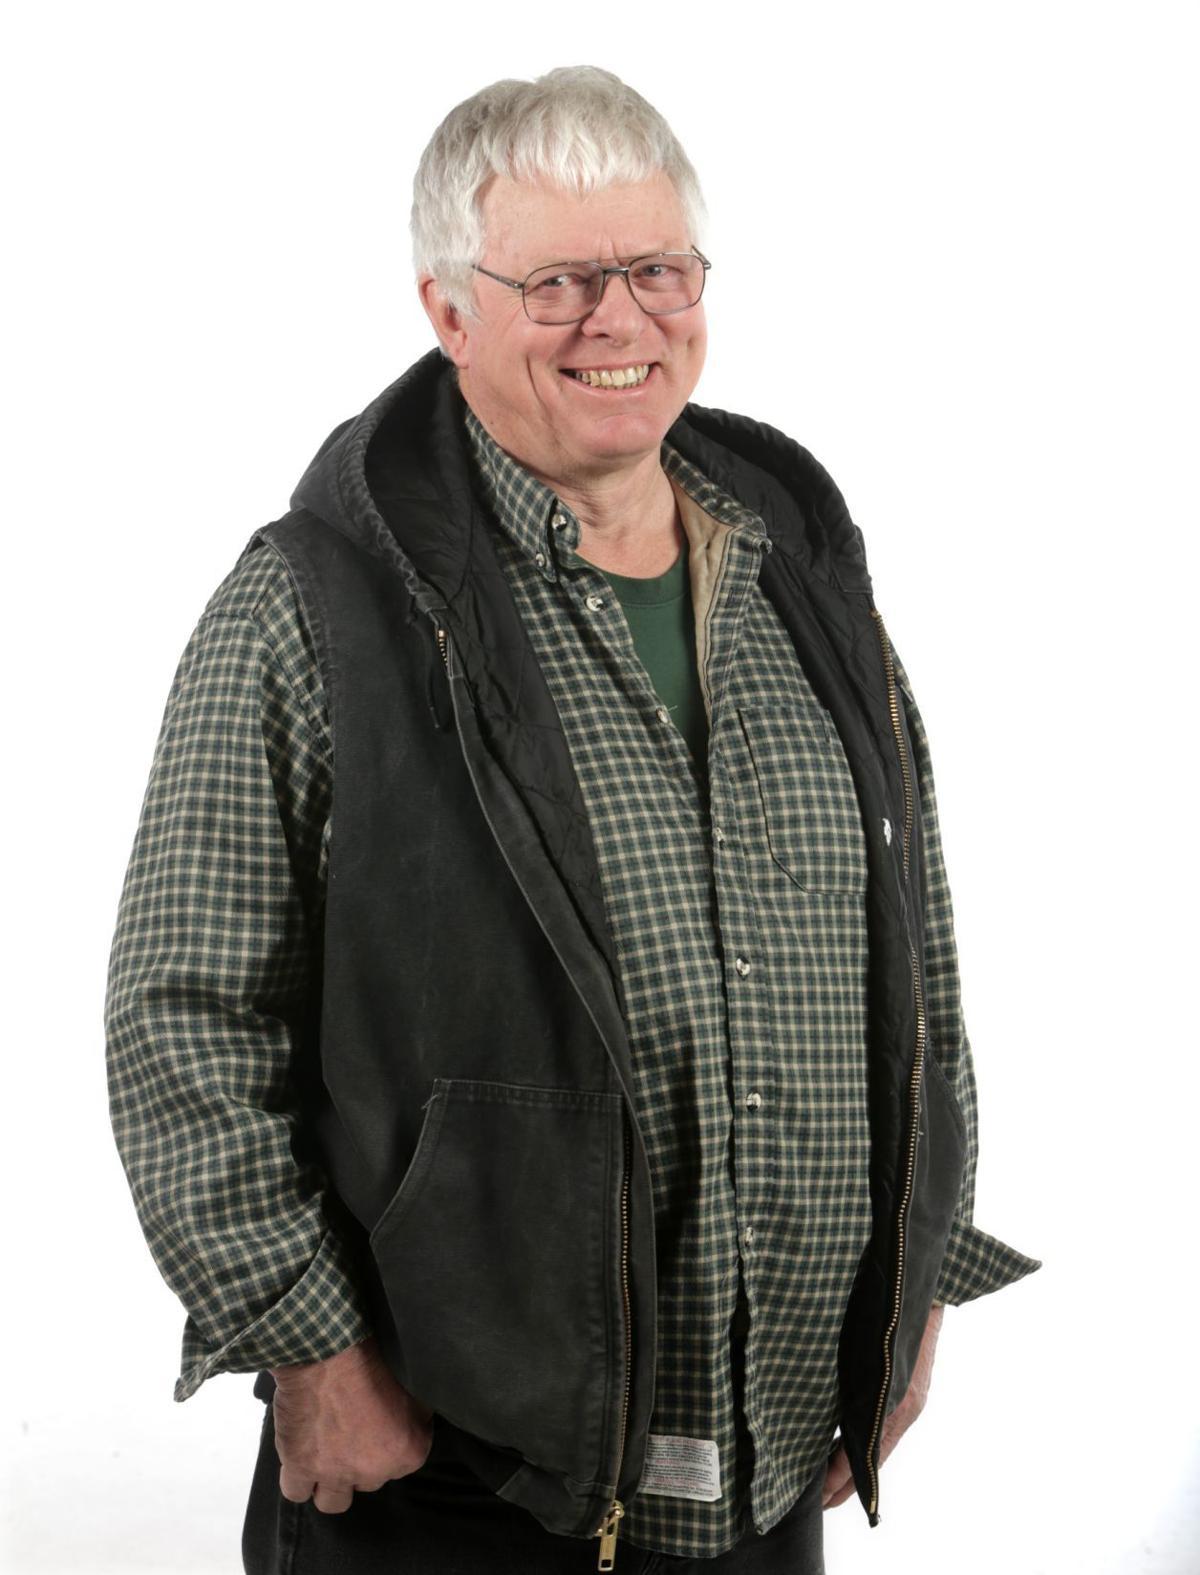 Vietnam veteran Tom Schumacher